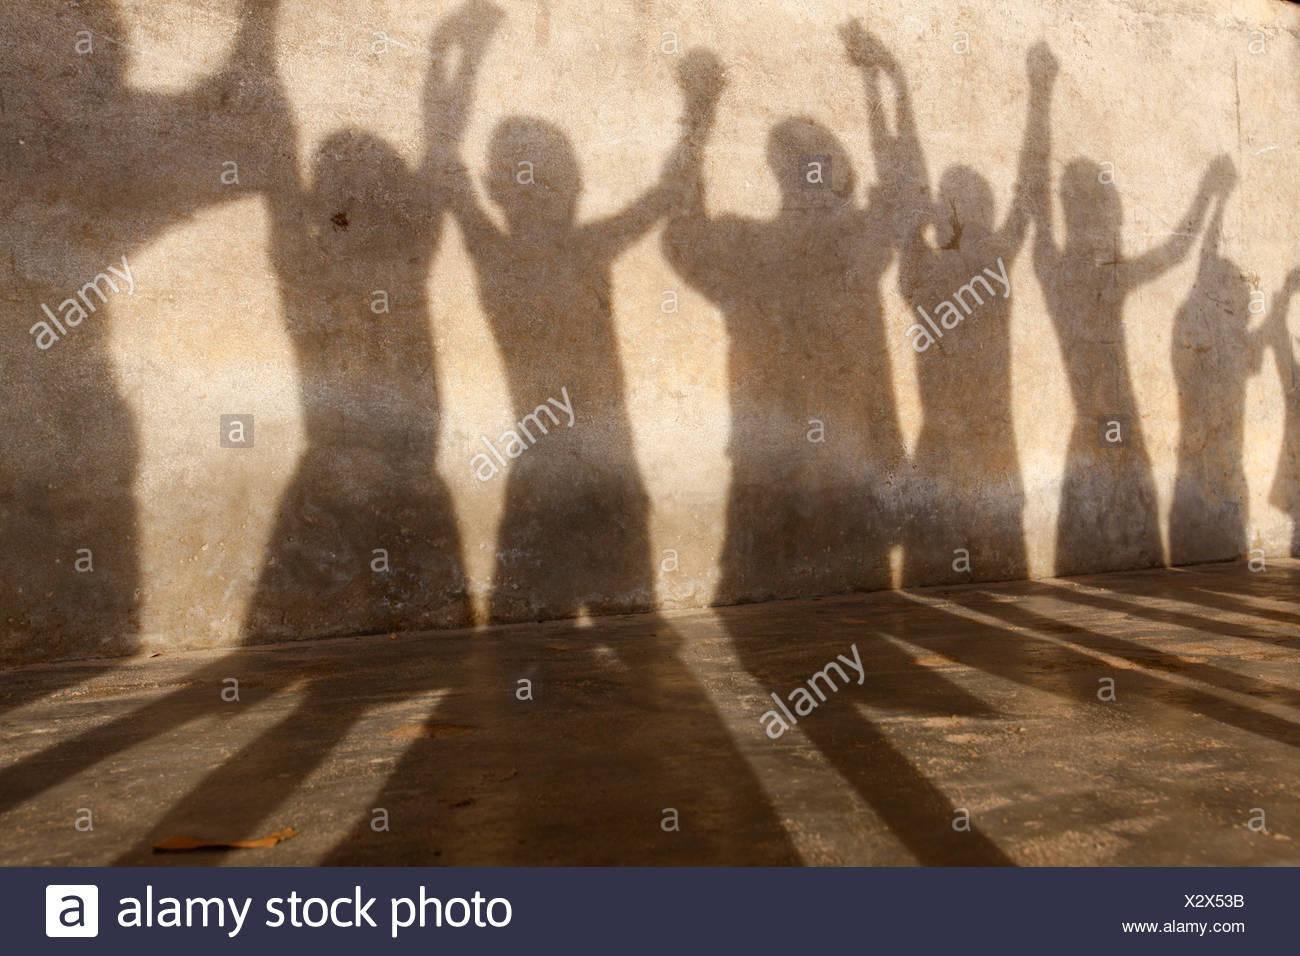 GROUP OF CHILDREN - Stock Image